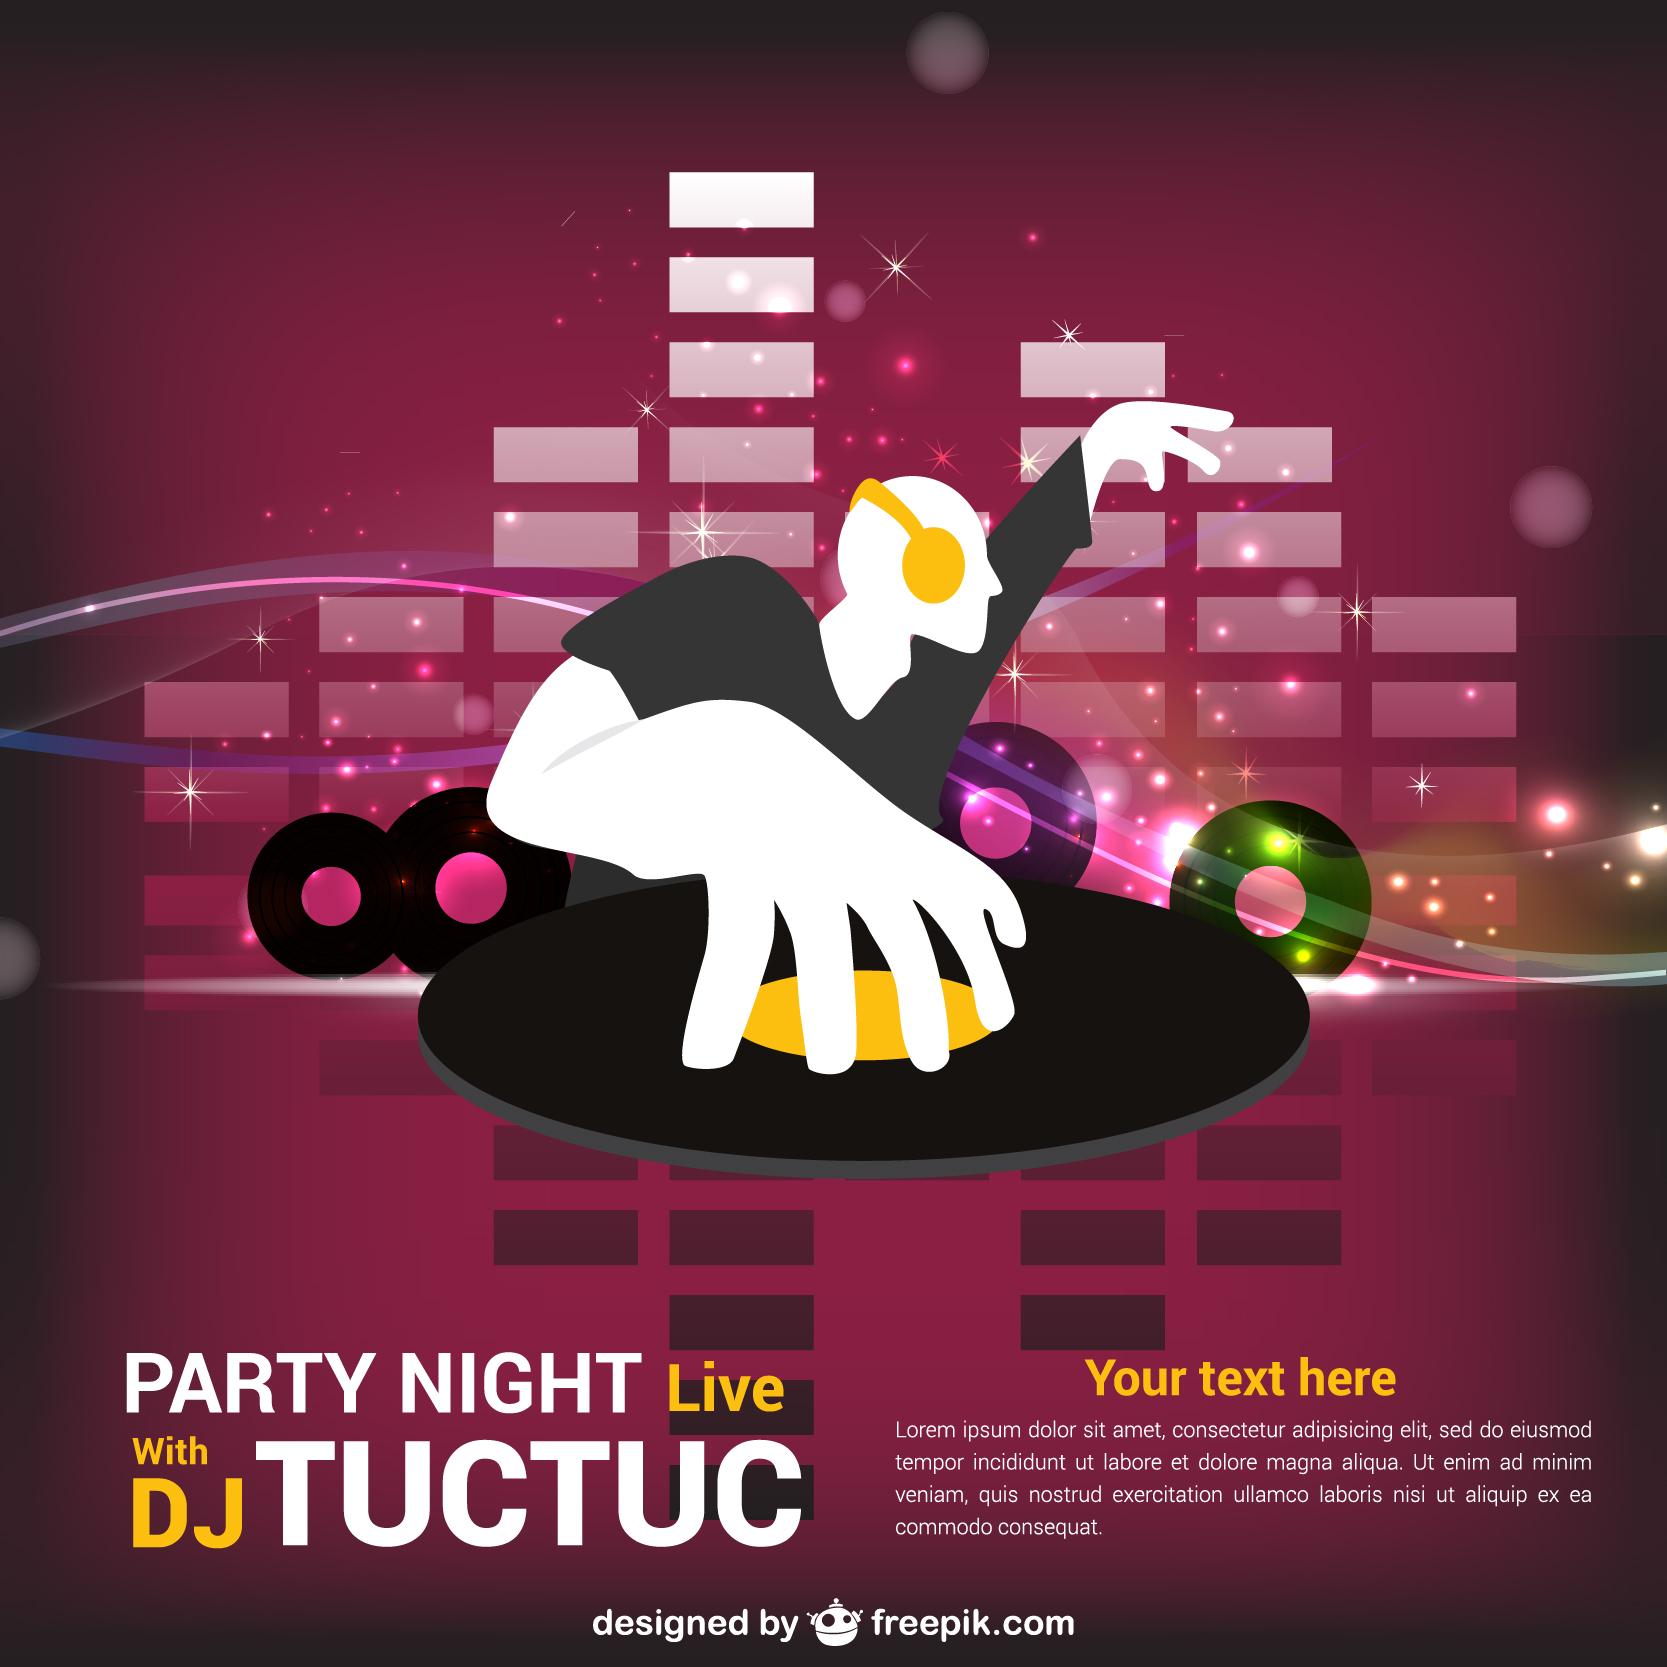 32 Spectacular Free DJ Flyer Templates : PSD, DOC - Demplates